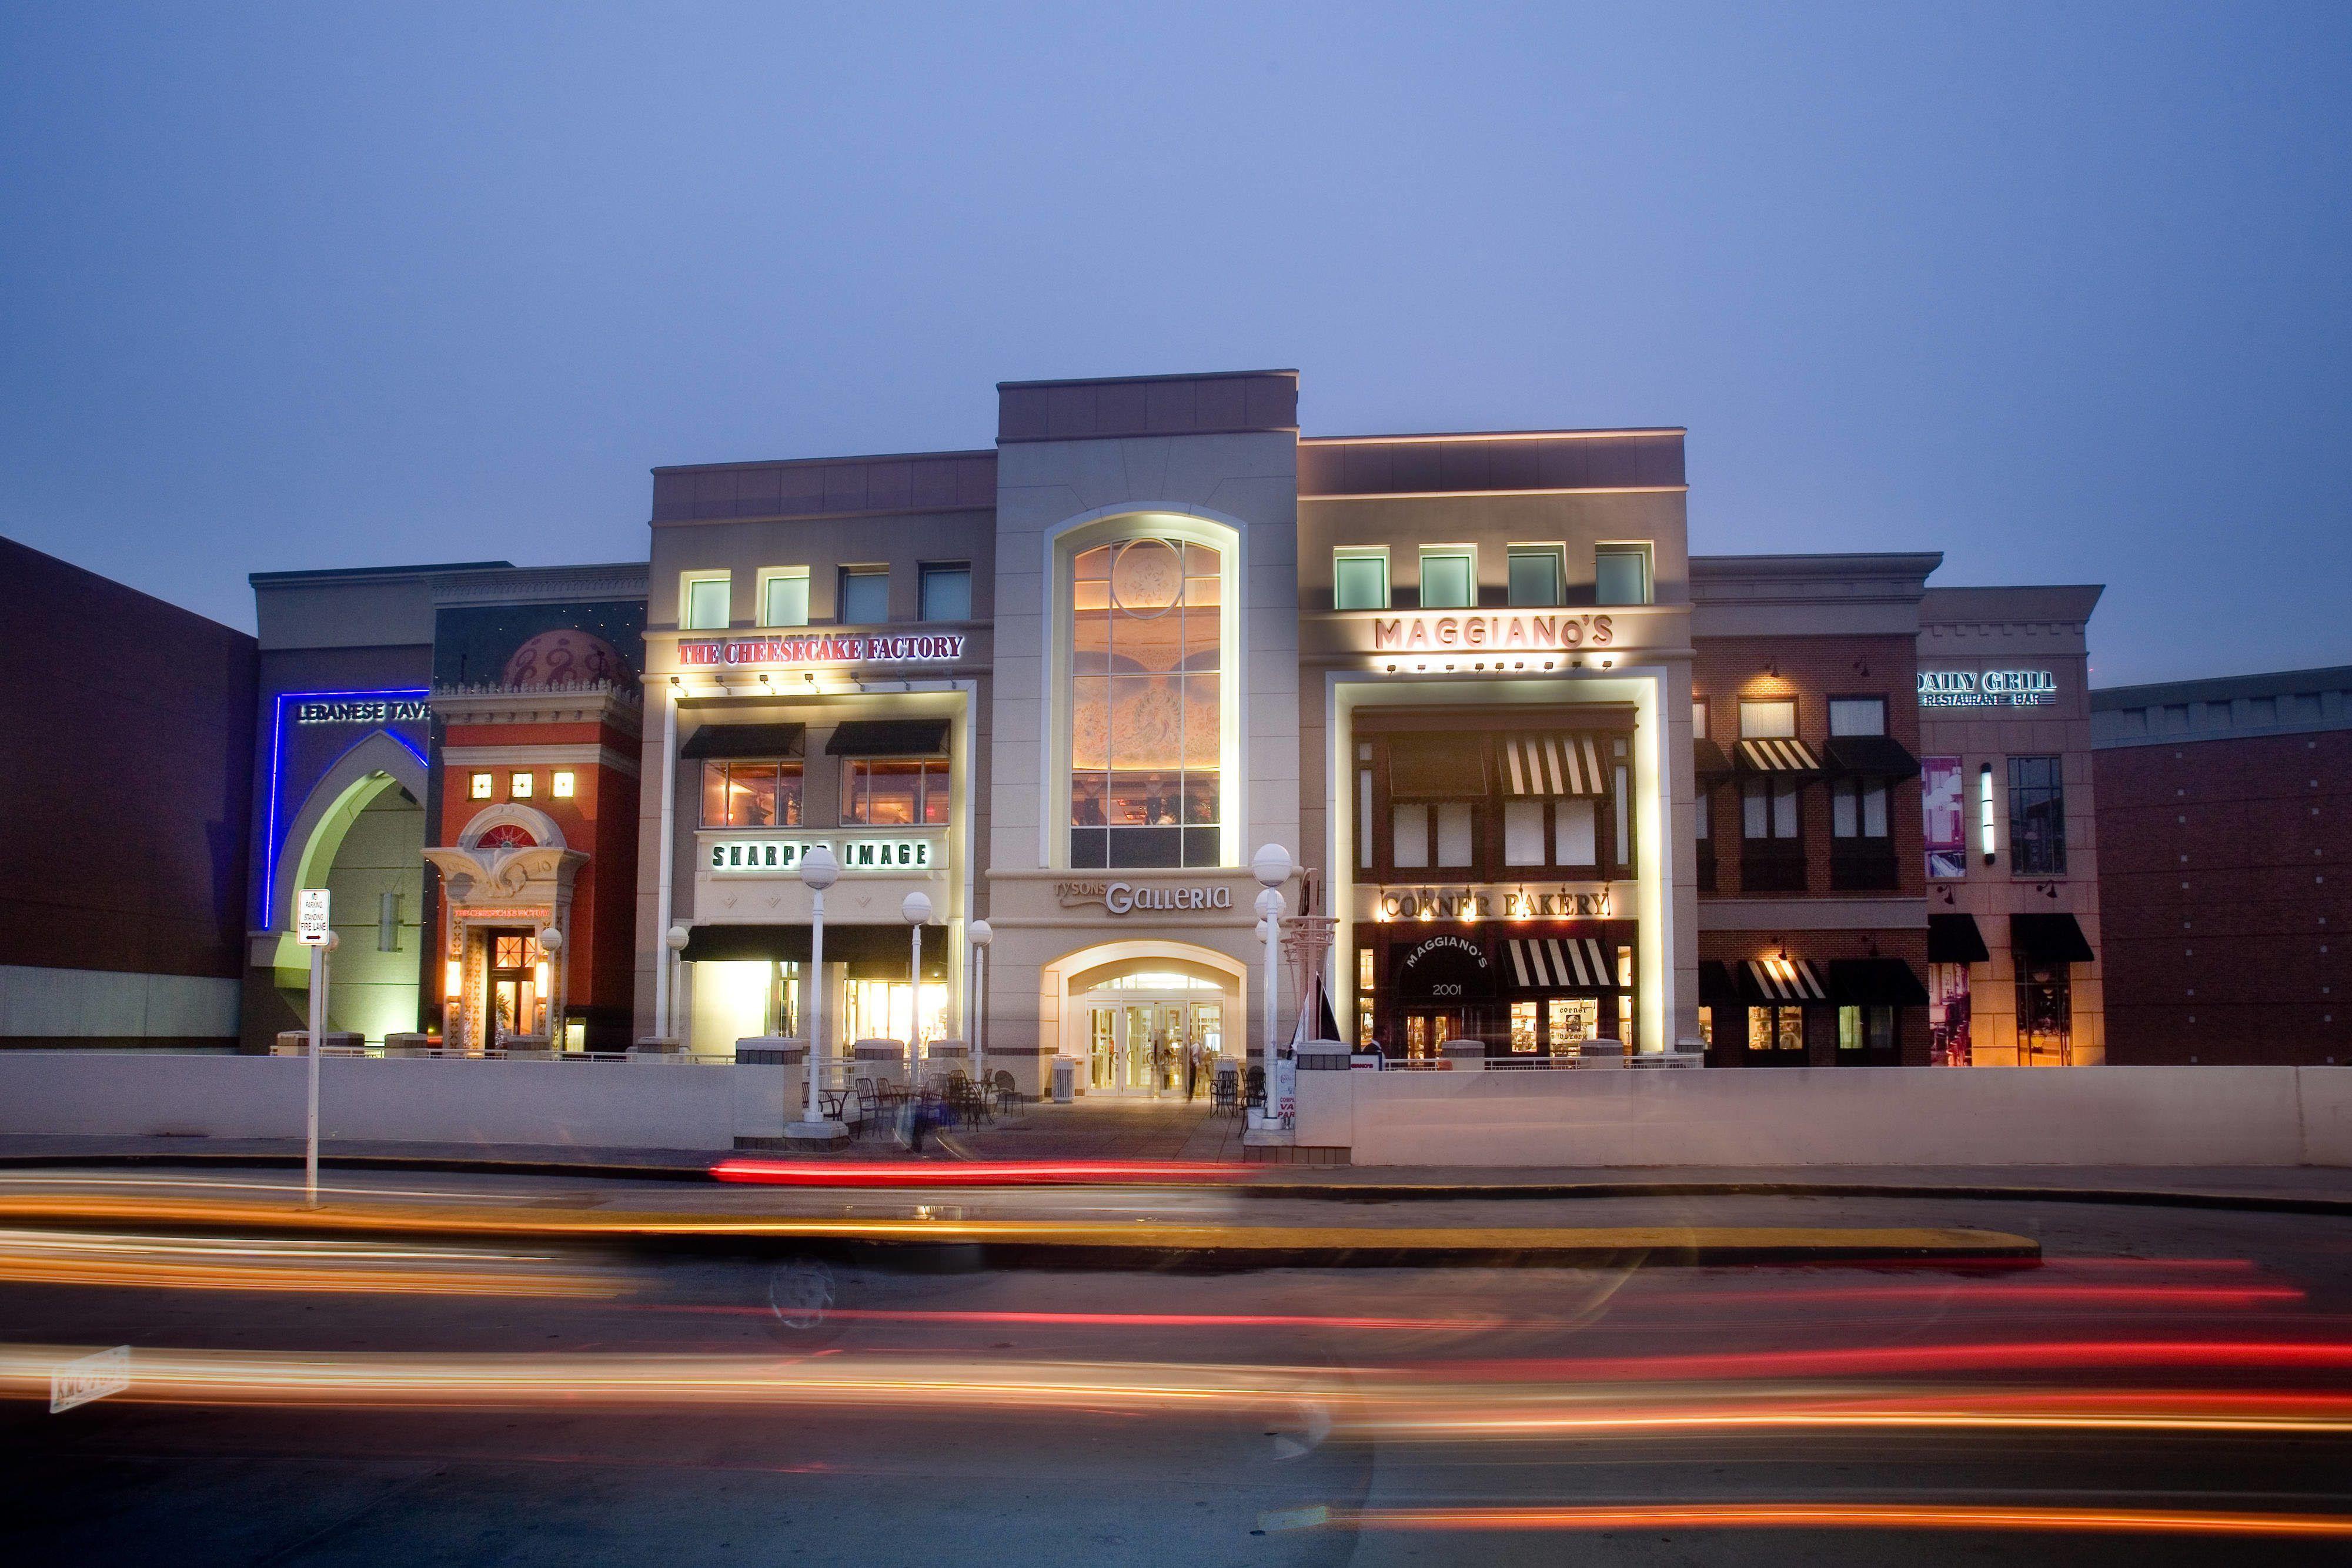 Courtyard Dunn Loring Fairfax Tysons Galleria enjoying,